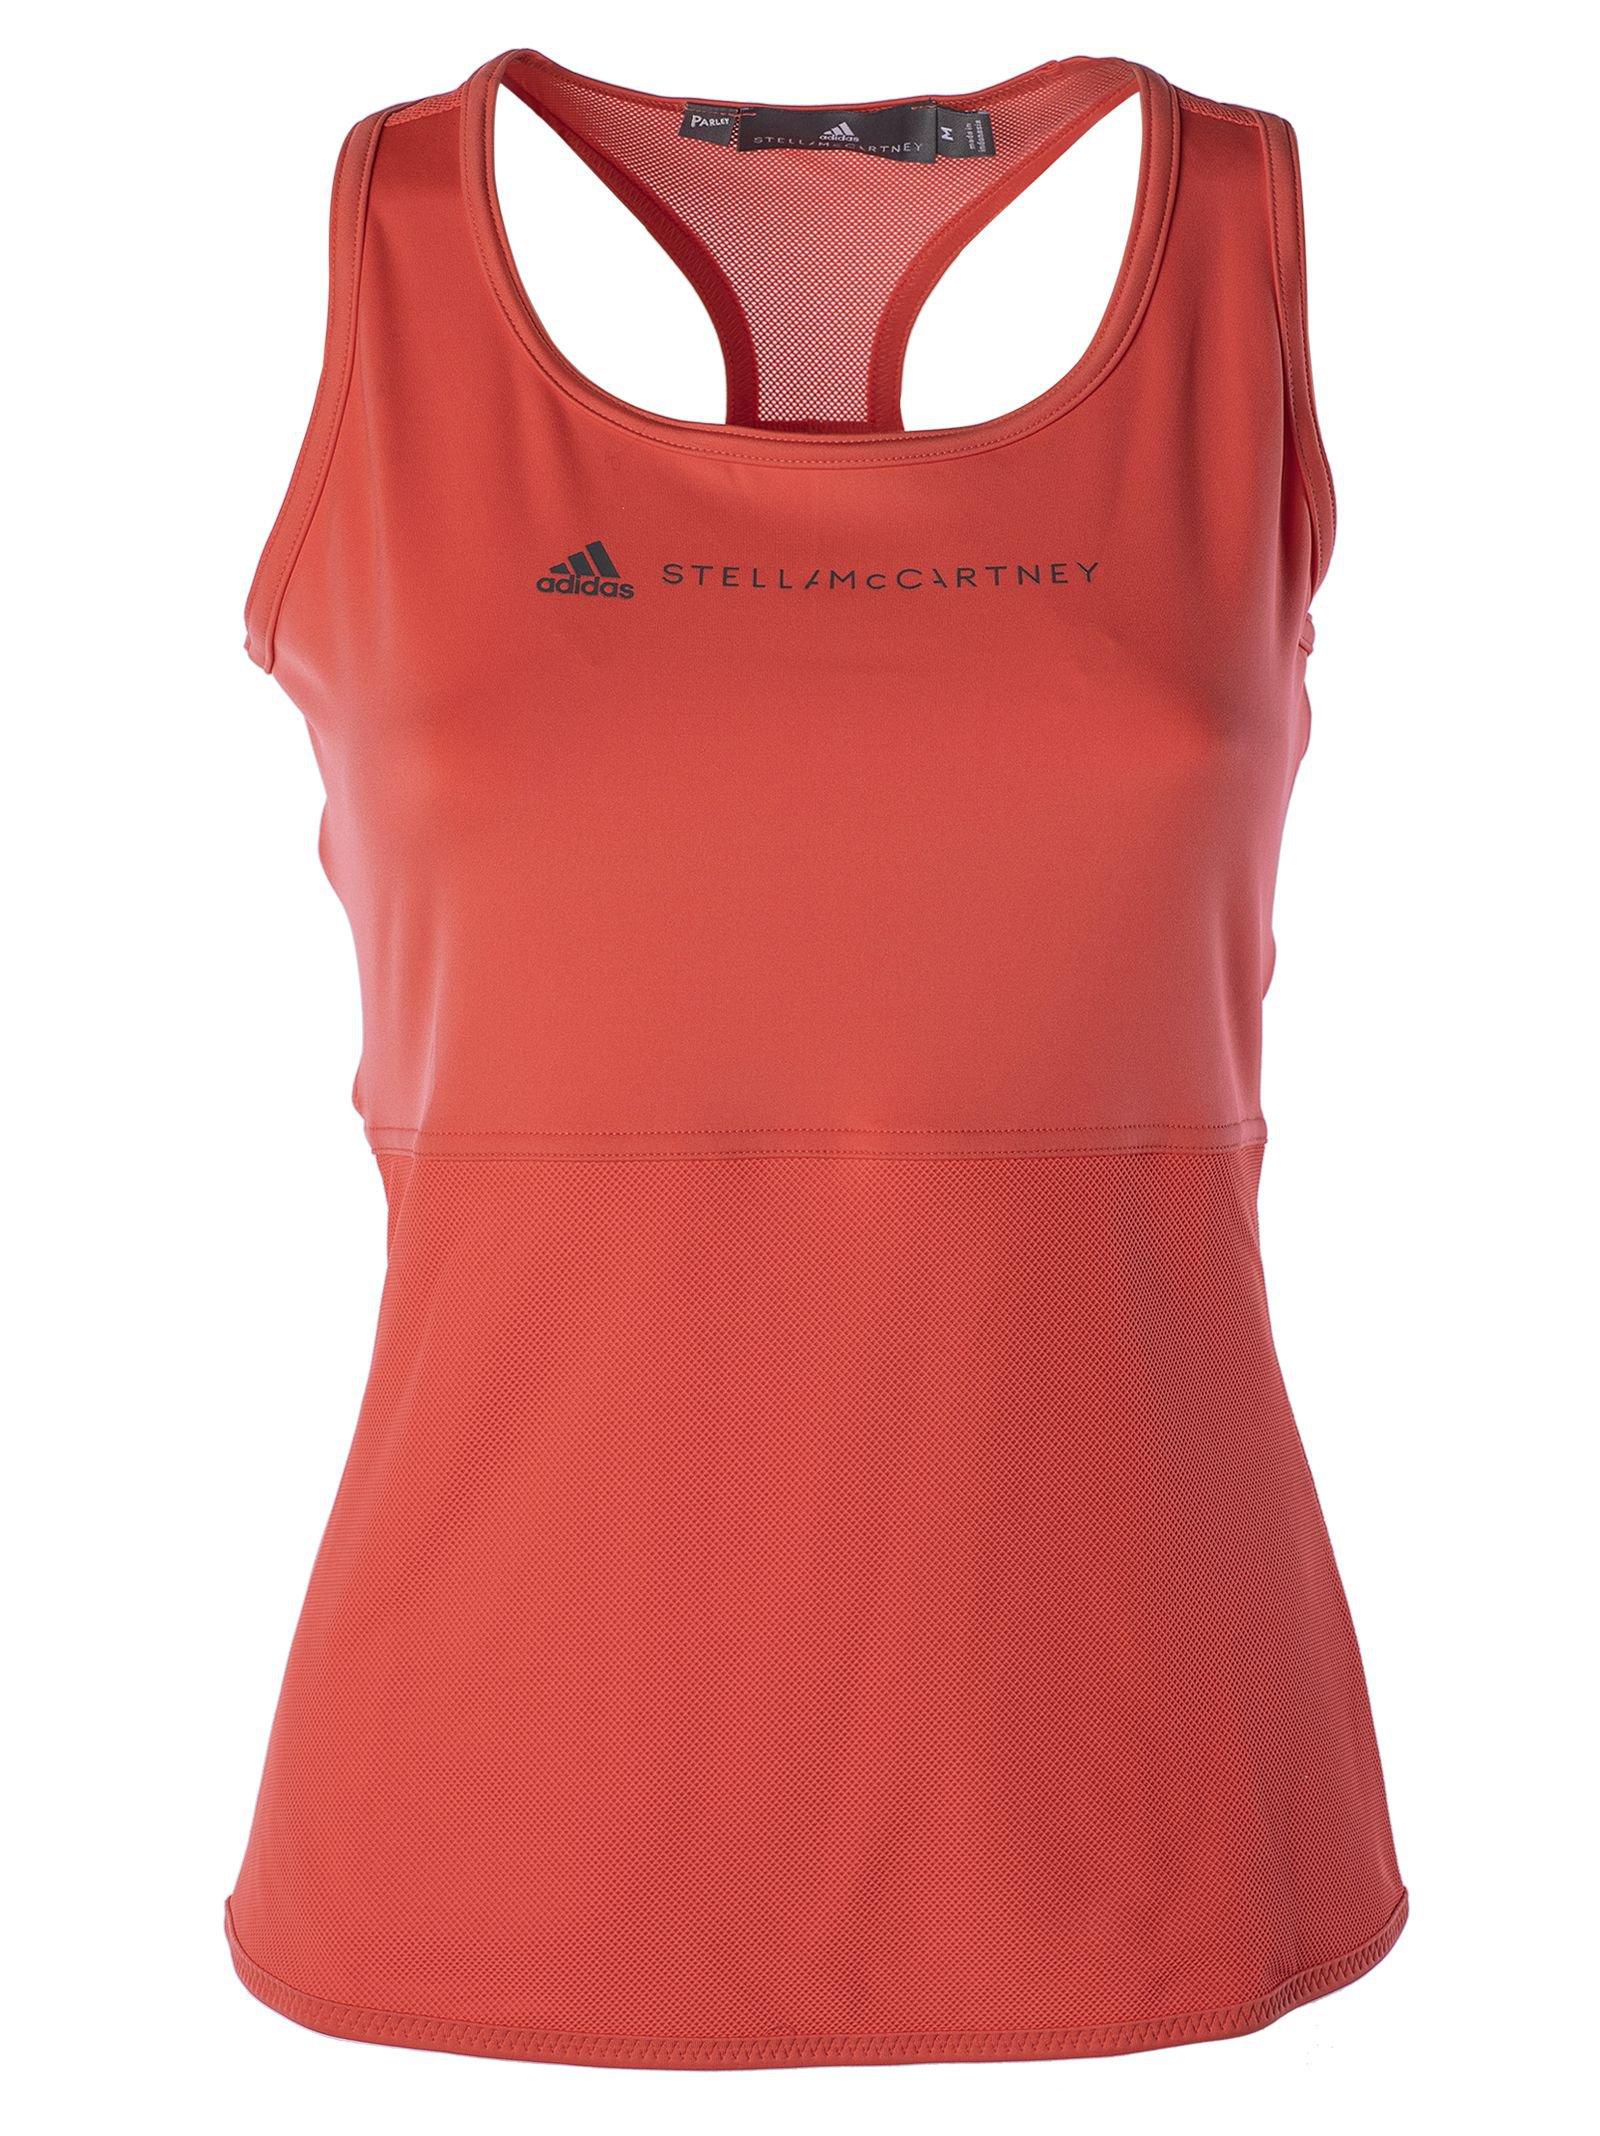 Adidas Sports Tank Top